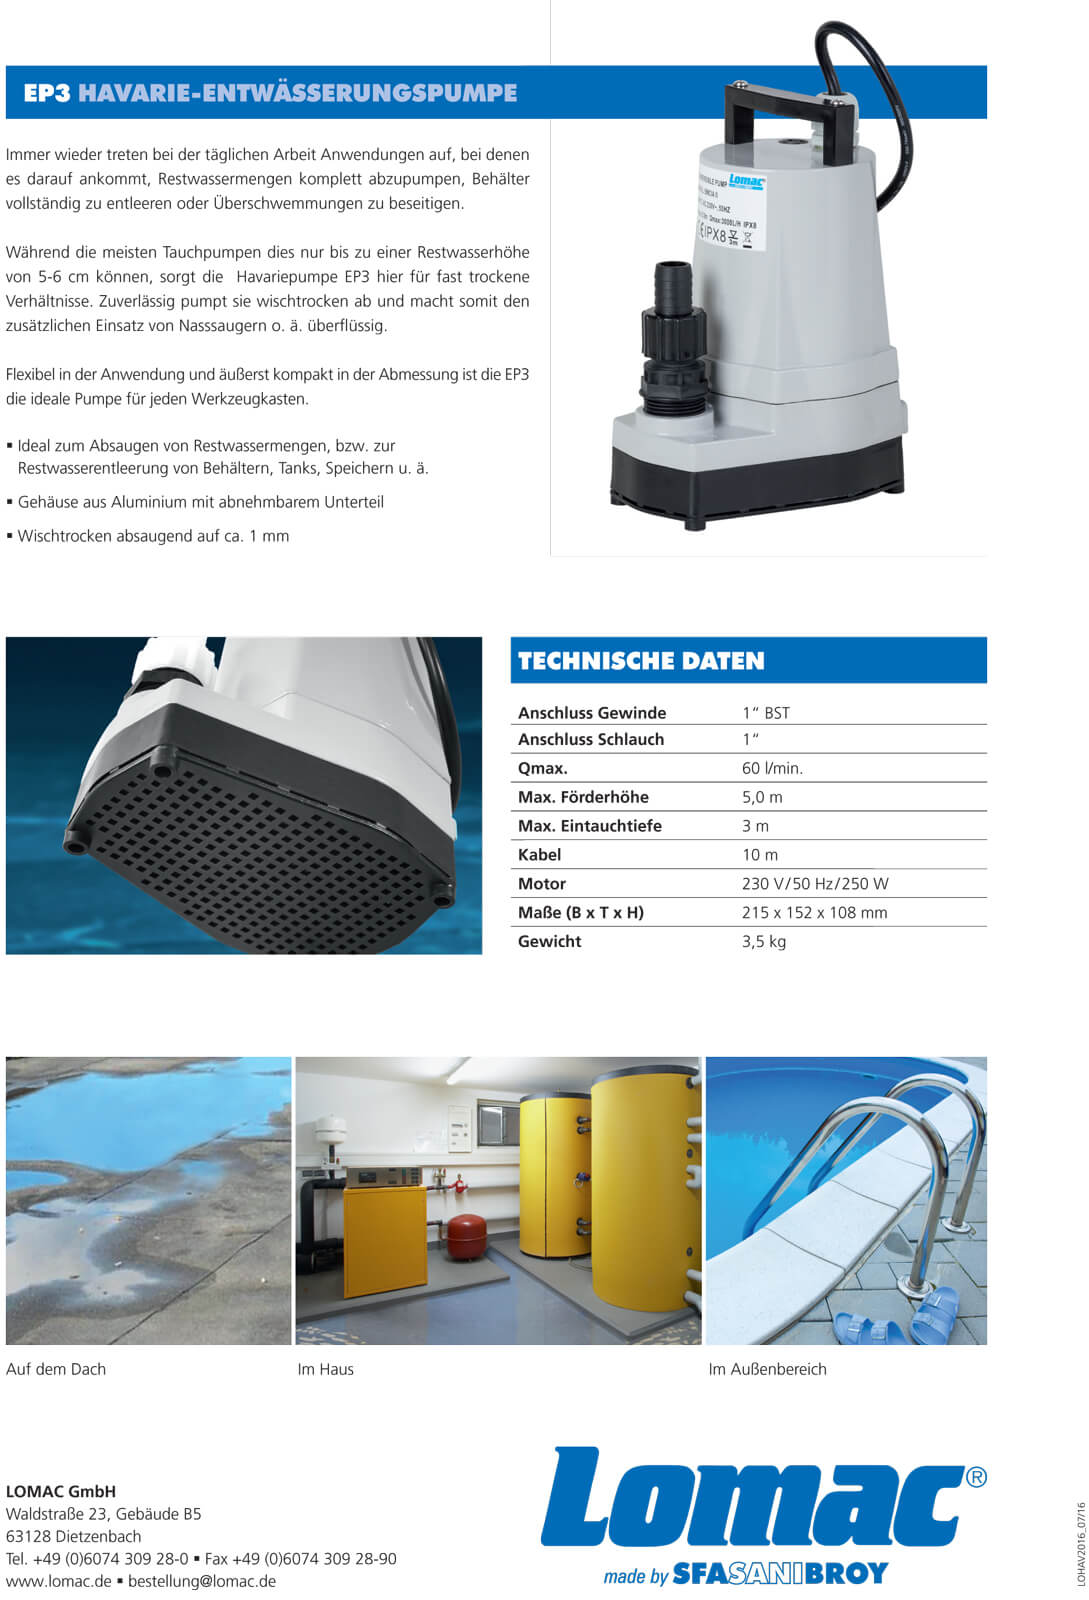 SFA Sanibroy Lomac Havariepumpe Blue-Max BM CIA EP3 flachsaugende Pumpe Flachsaugpumpe Regenwasserpumpe Entwässerungspumpe